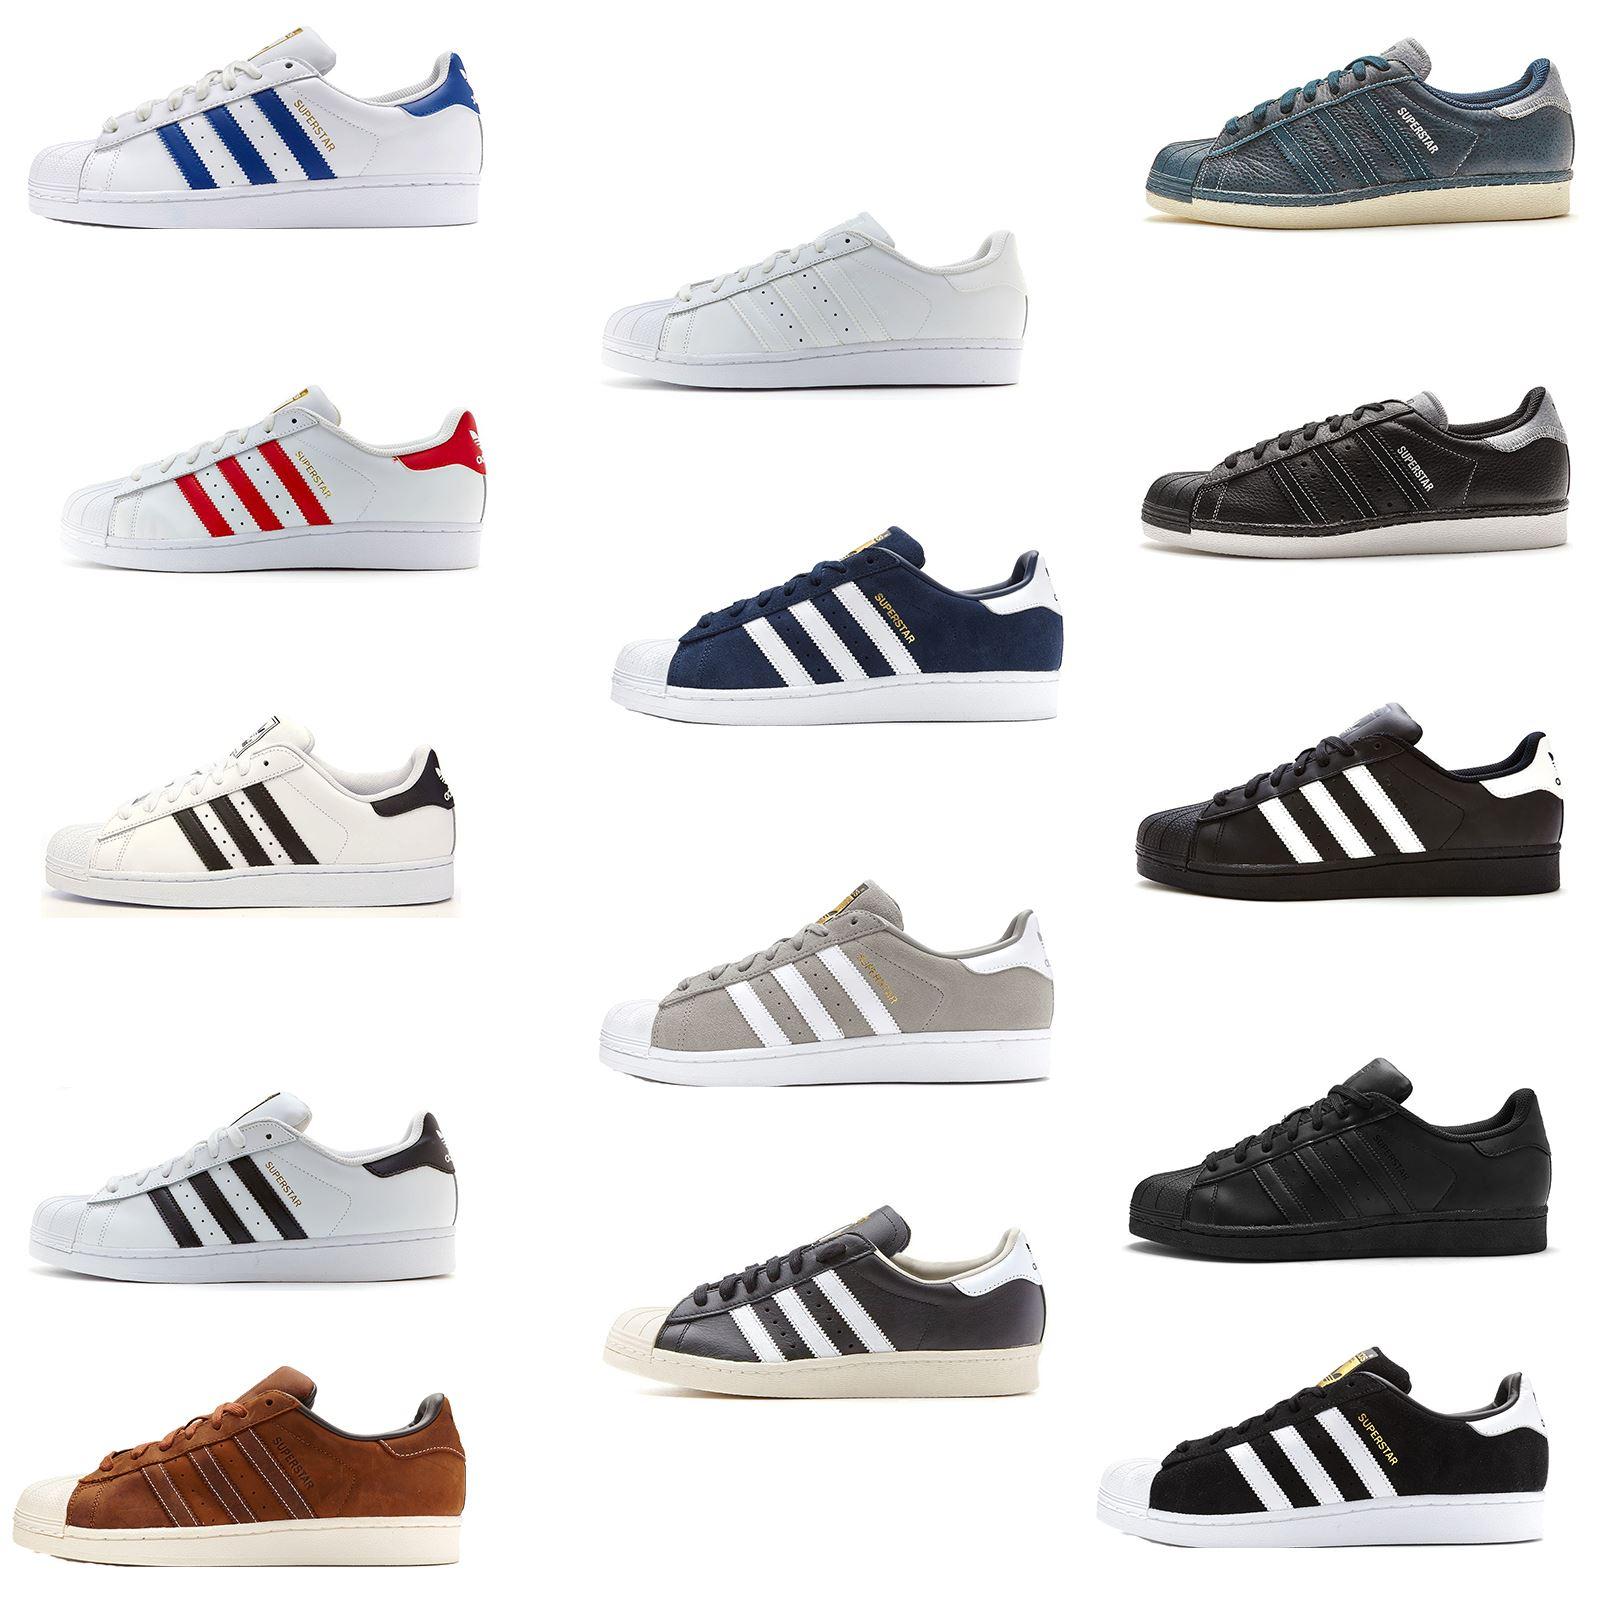 huge selection of bacdd 43e42 Hommes Adidas Originals Superstar cuir formateurs dans toutes les tailles